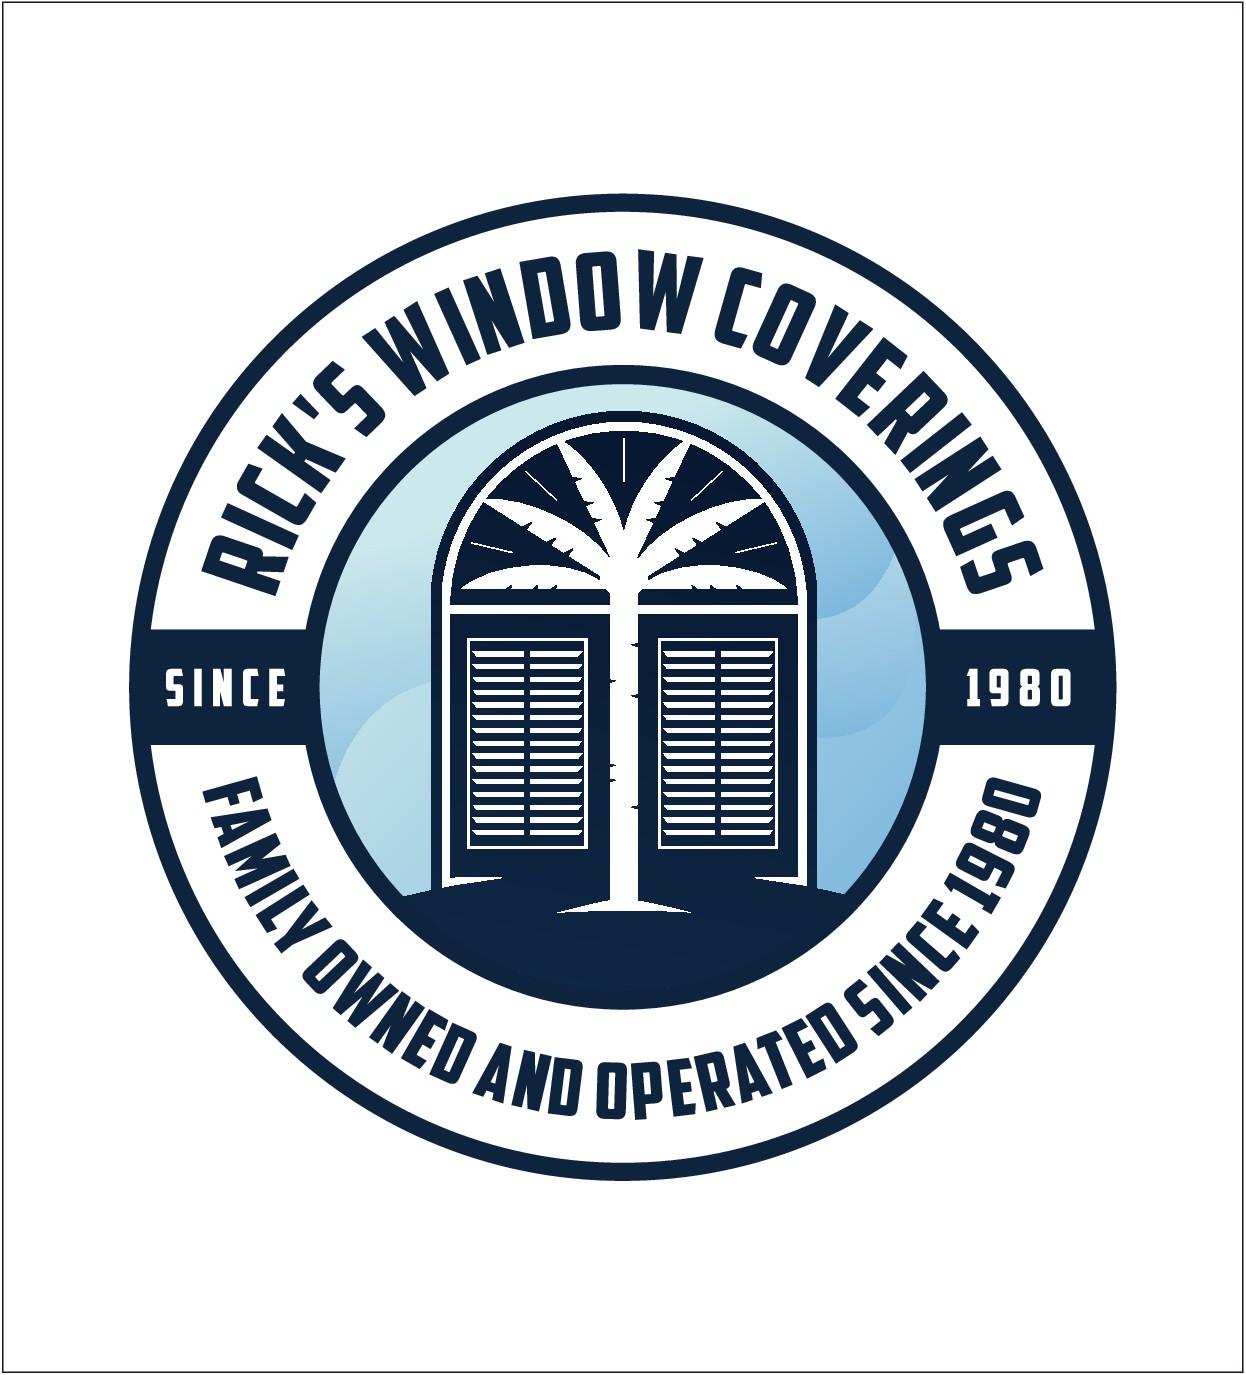 Tropical, beach-themed logo for Florida window treatment company